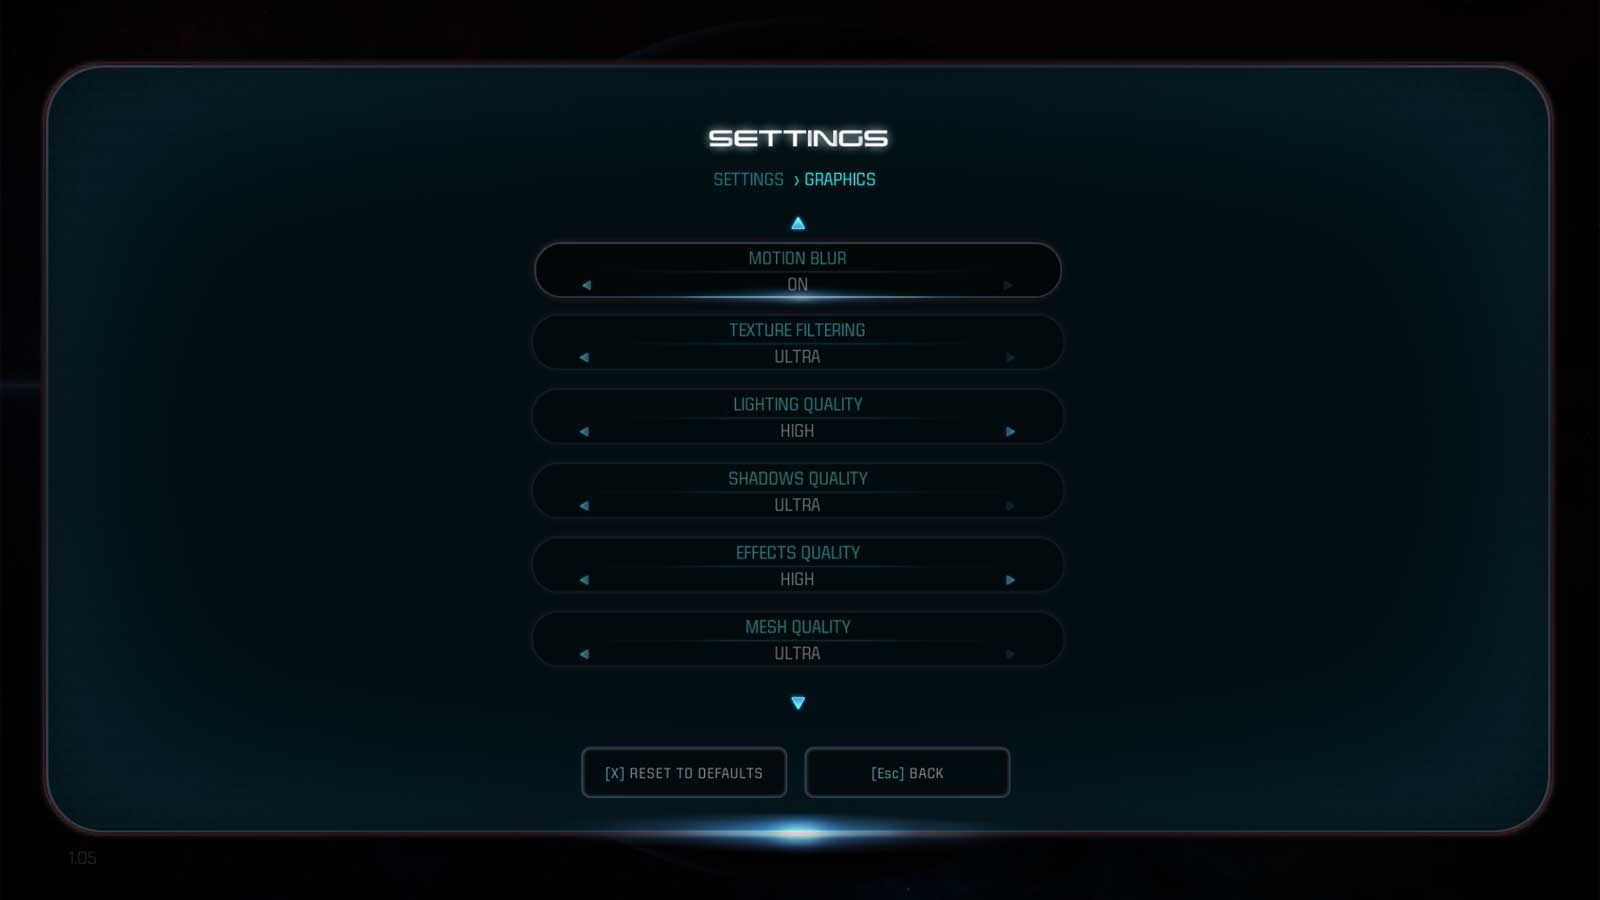 Mass Effect: Andromeda nastavenie 4